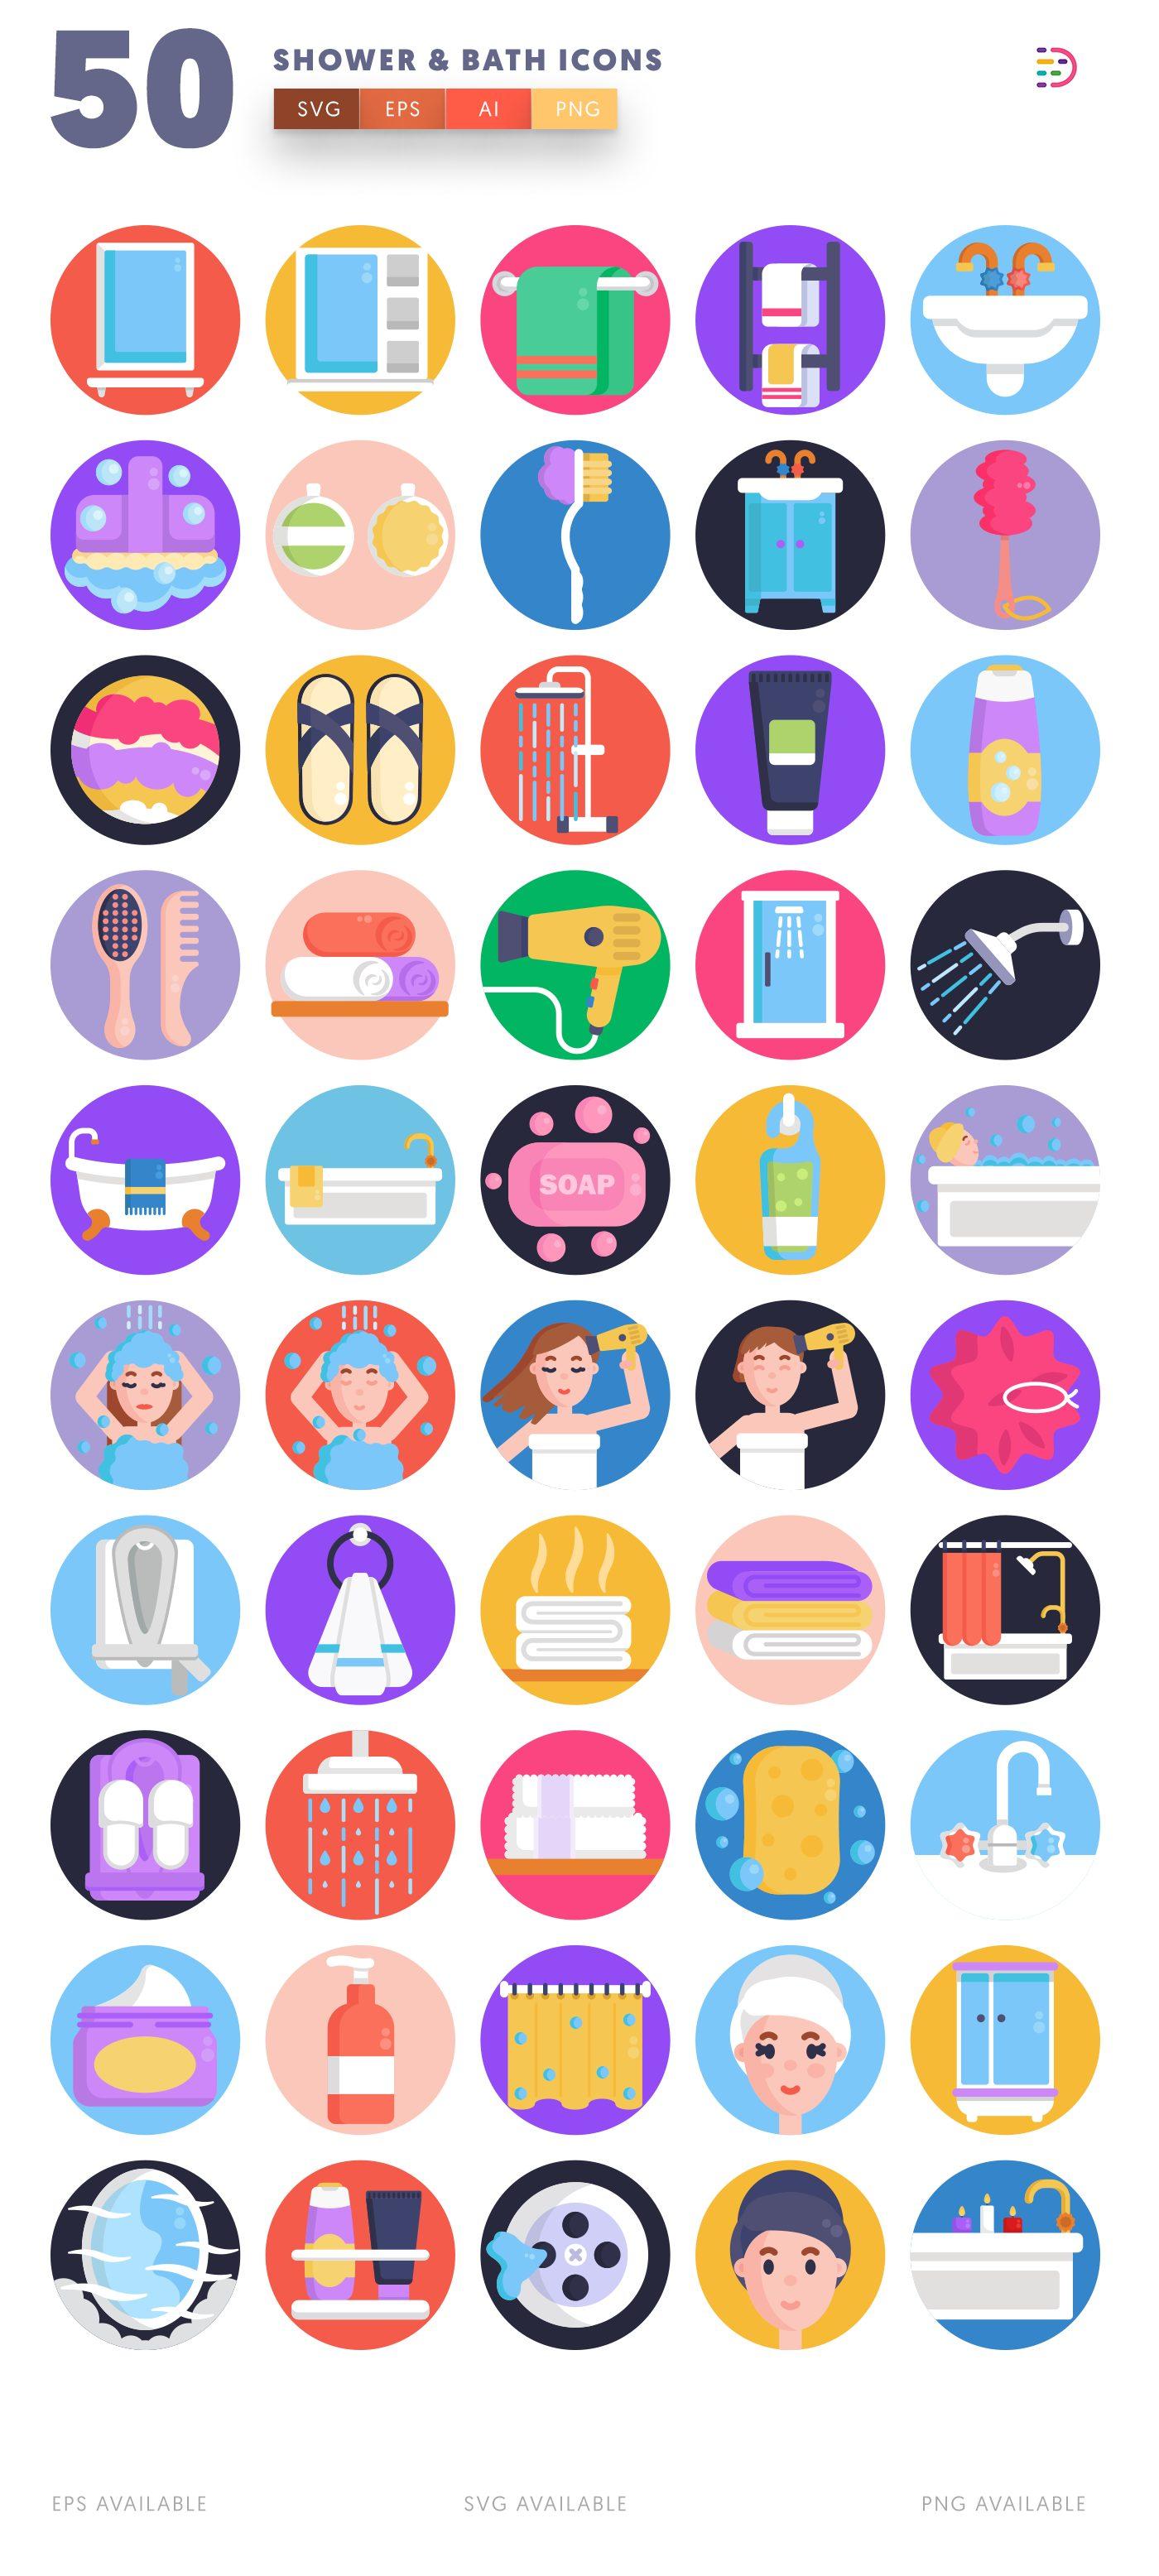 Shower & Bath icon pack